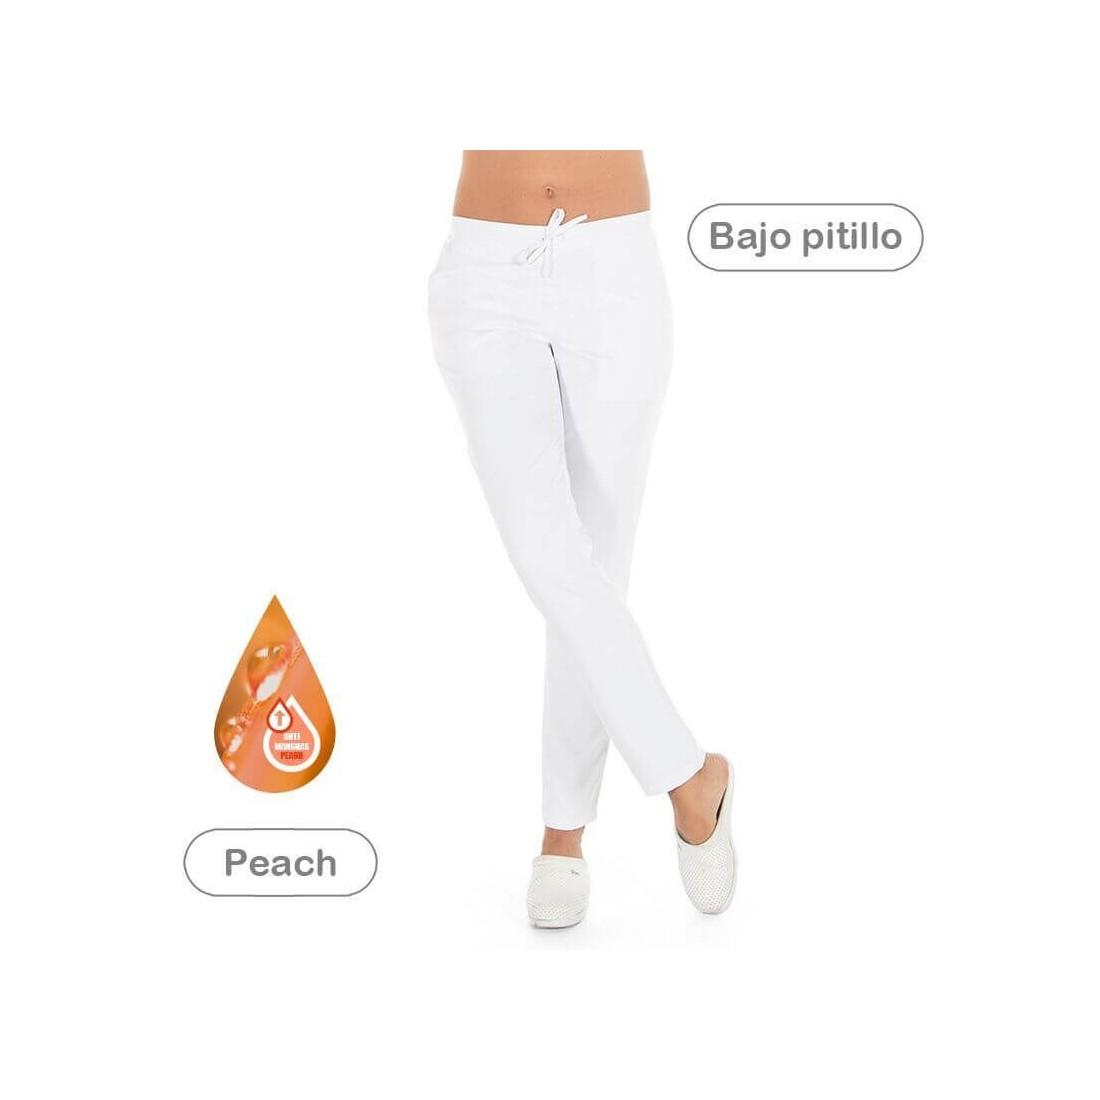 Pantalón antimanchas